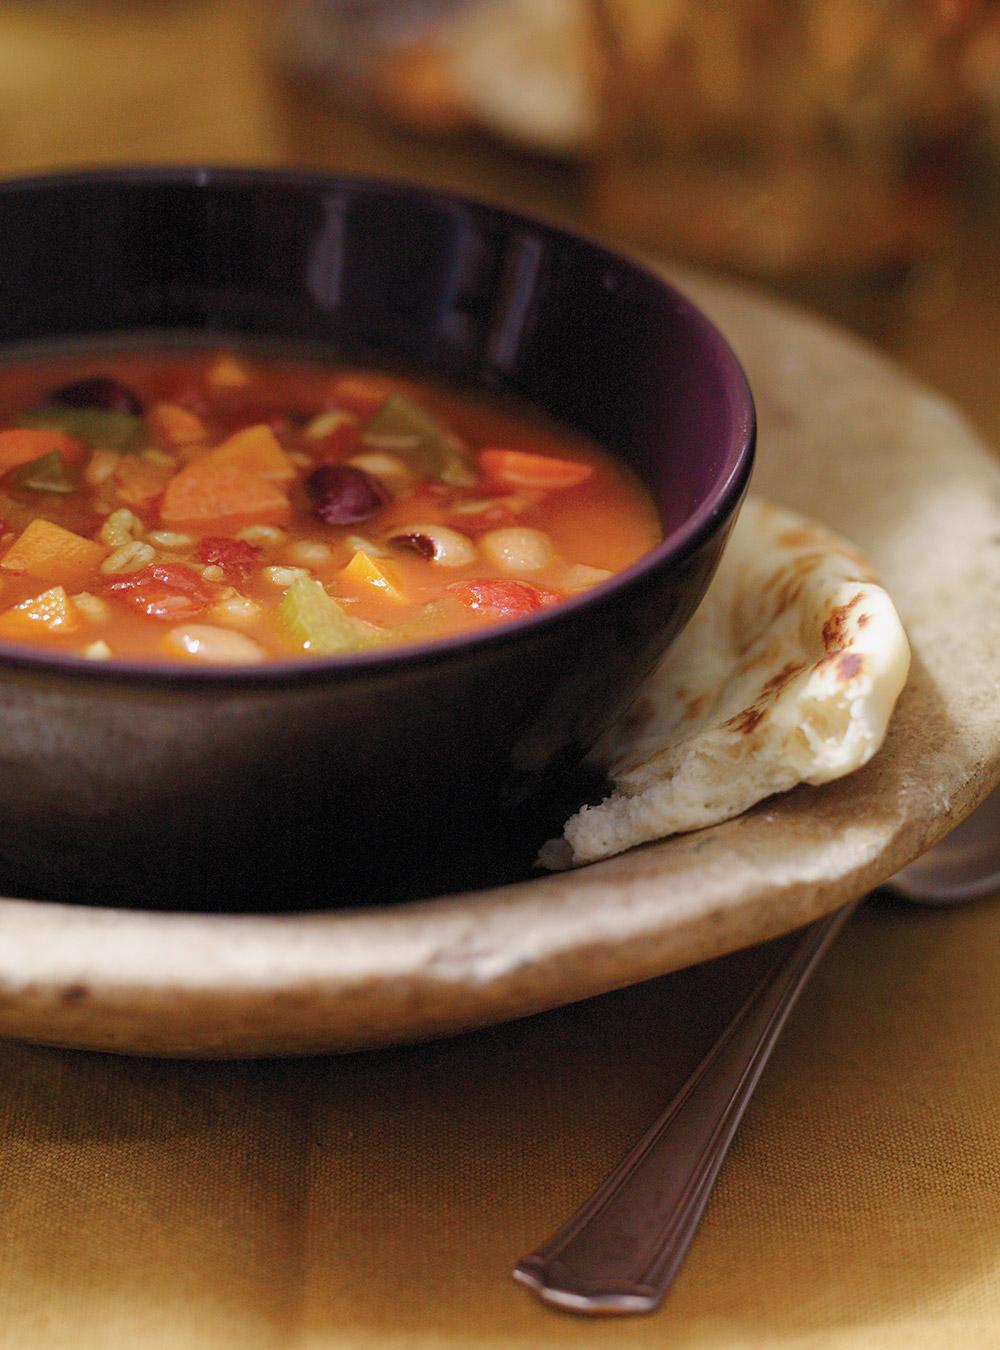 Soupe repas aux l gumineuses et au curcuma ricardo - Ricardo cuisine mijoteuse ...